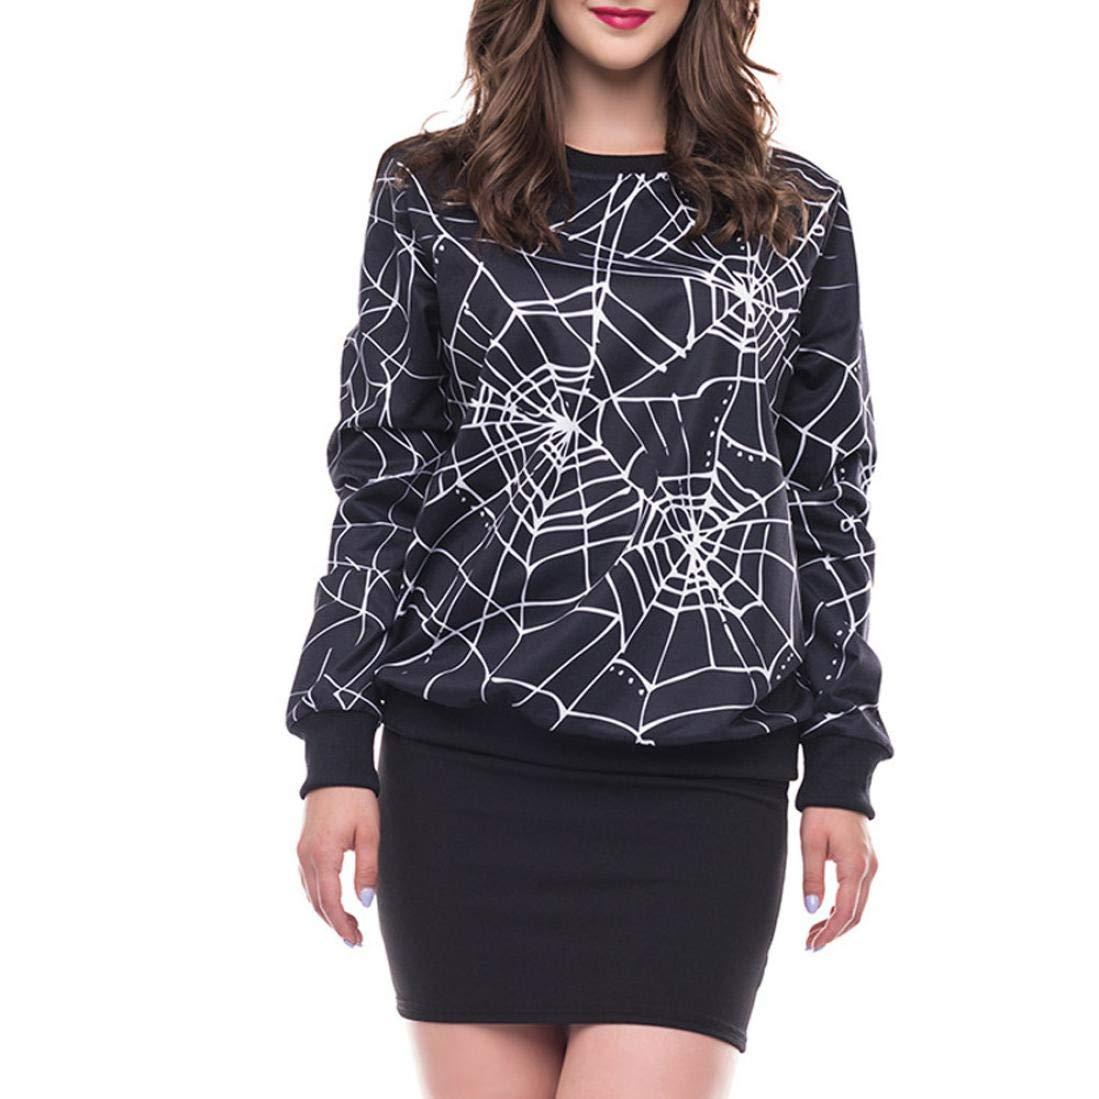 Nuoinet Clearance Women Halloween Spider Web 3D Print Sweatshirt Pullover Pocket Long Sleeve Casual Tops (M, Black)